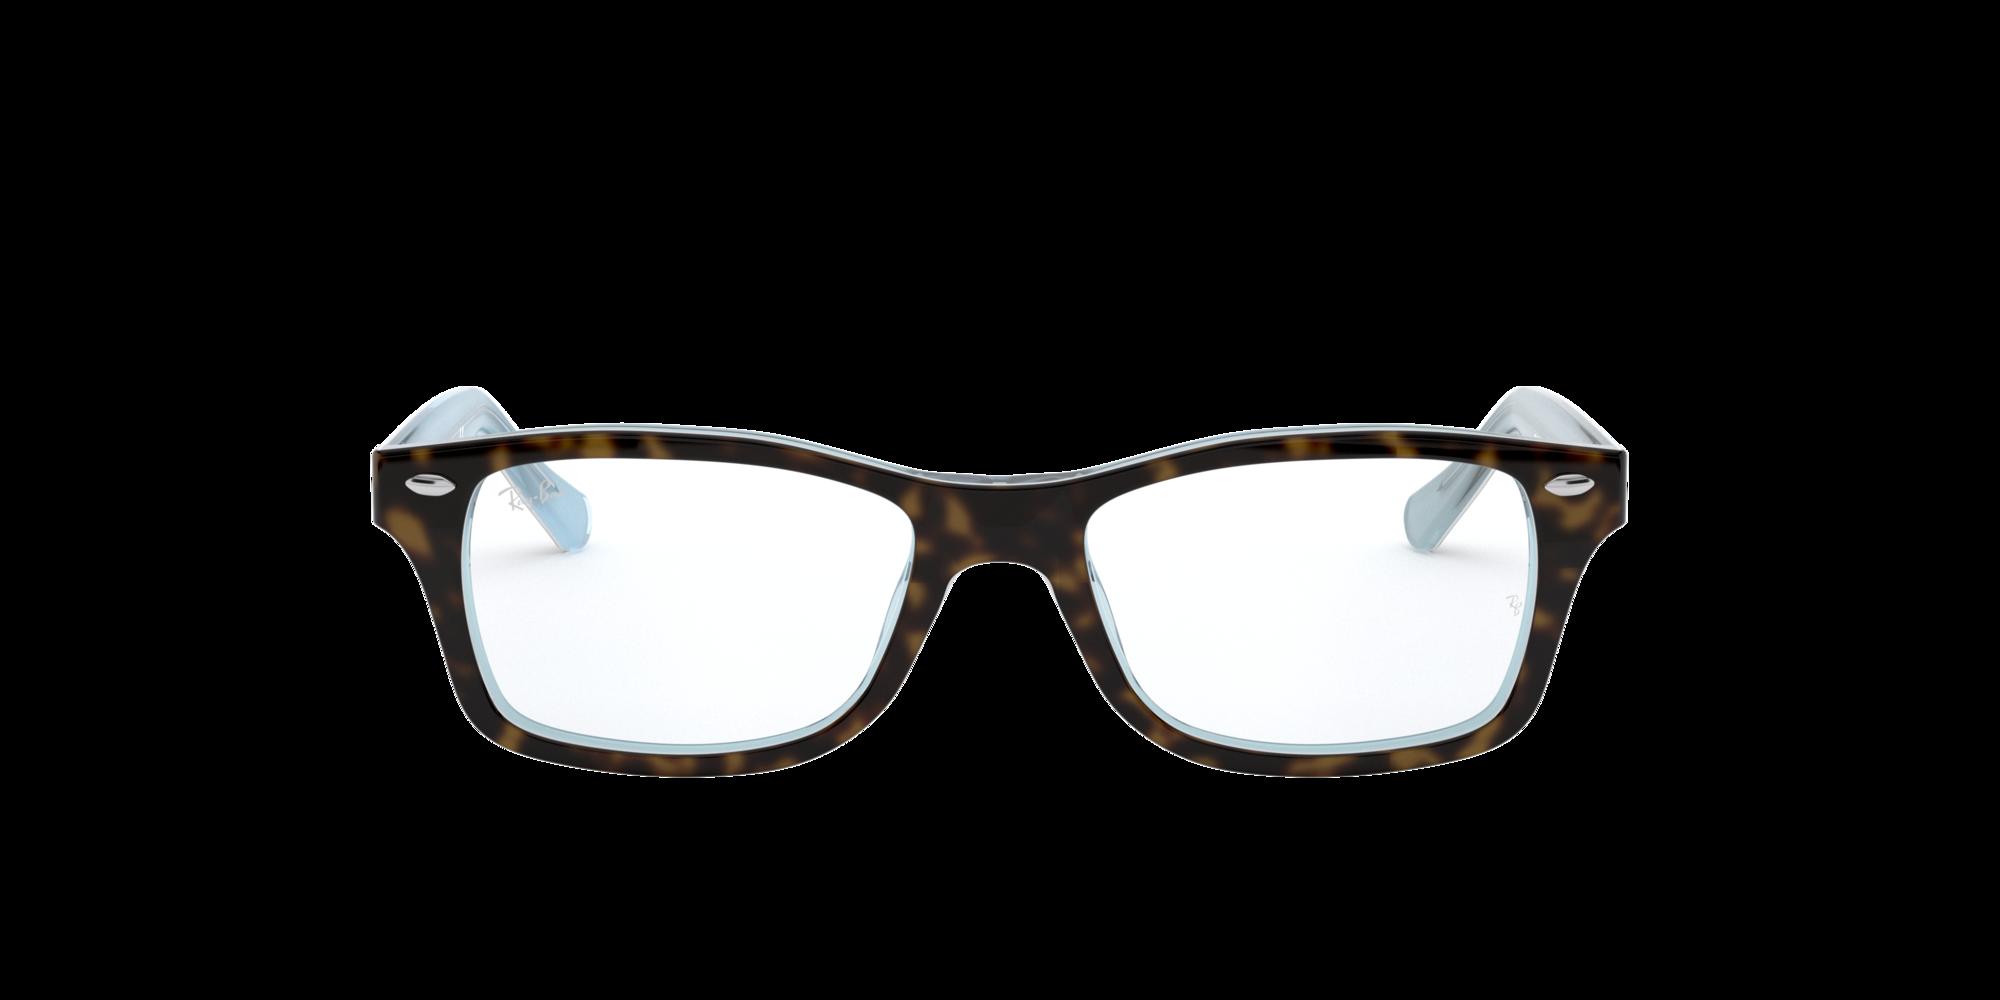 RayBan eyeglasses kids image